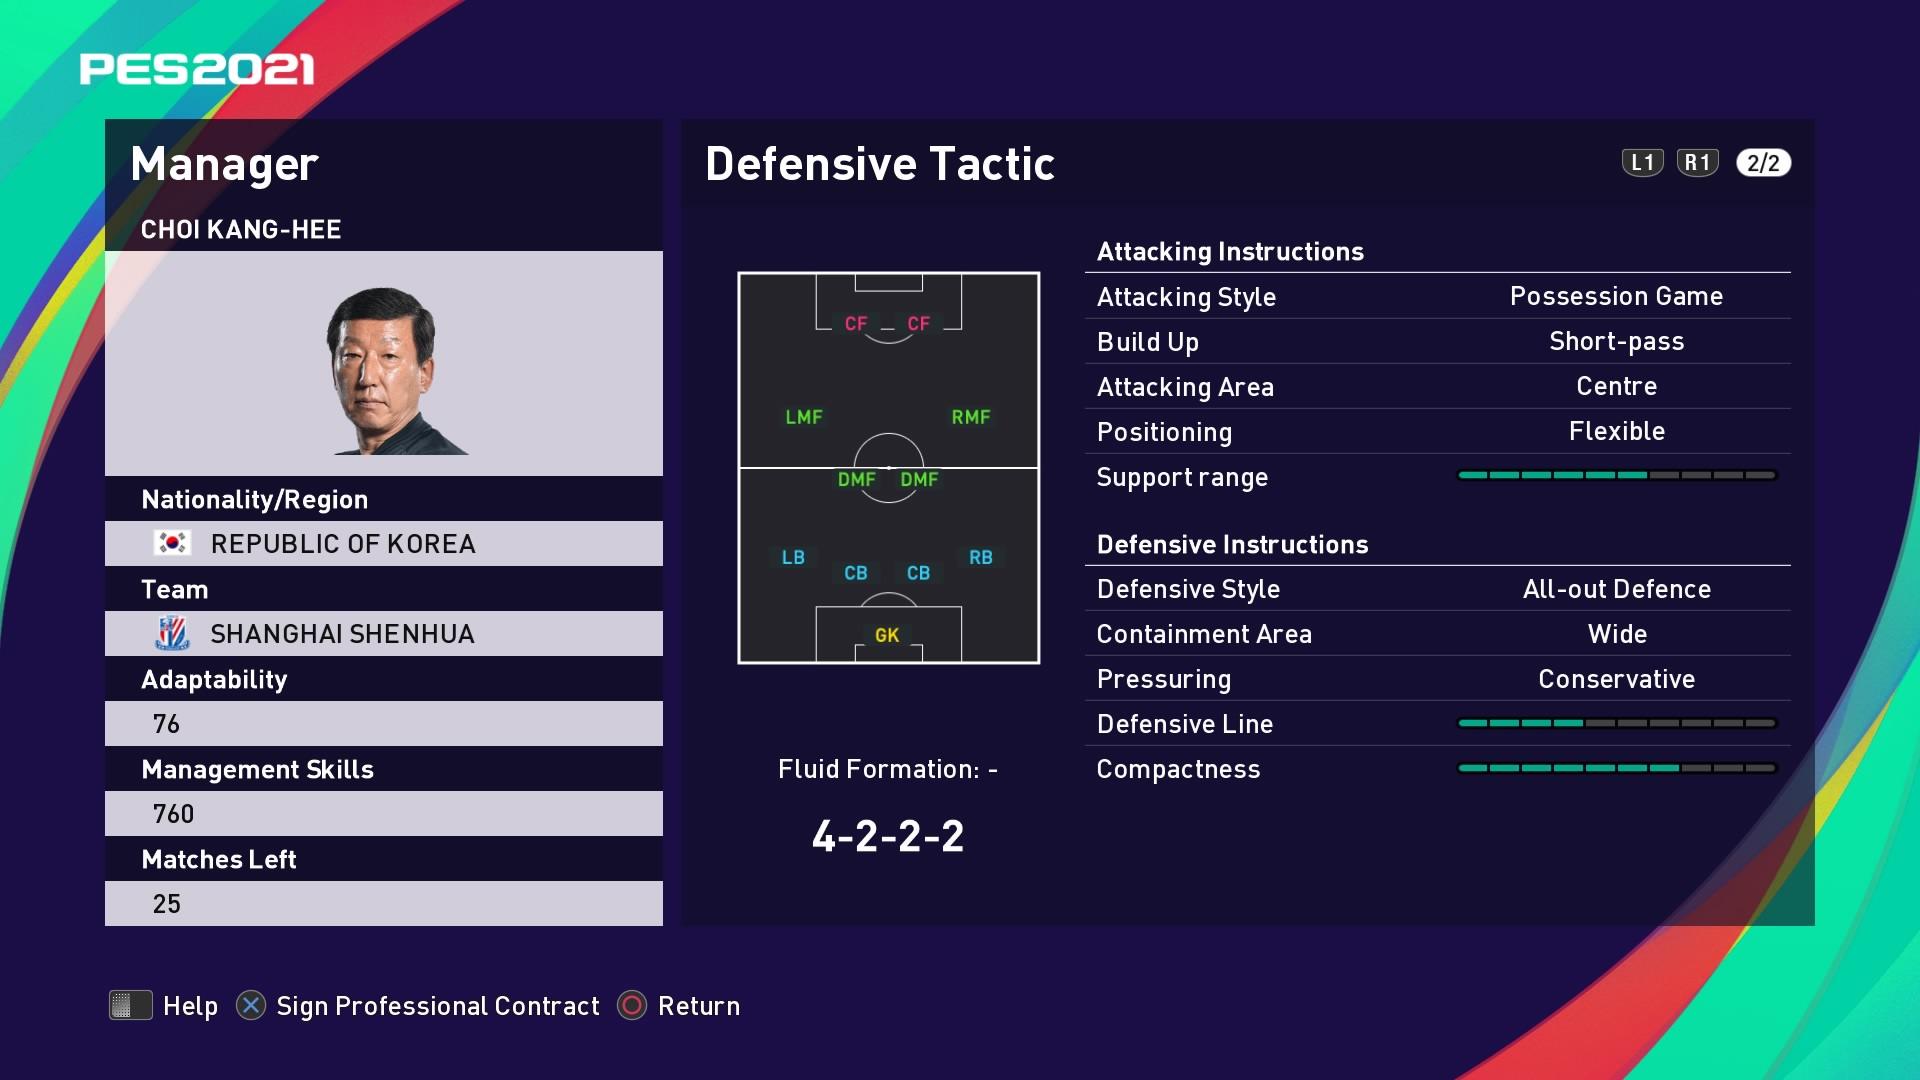 Choi Kang-Hee Defensive Tactic in PES 2021 myClub